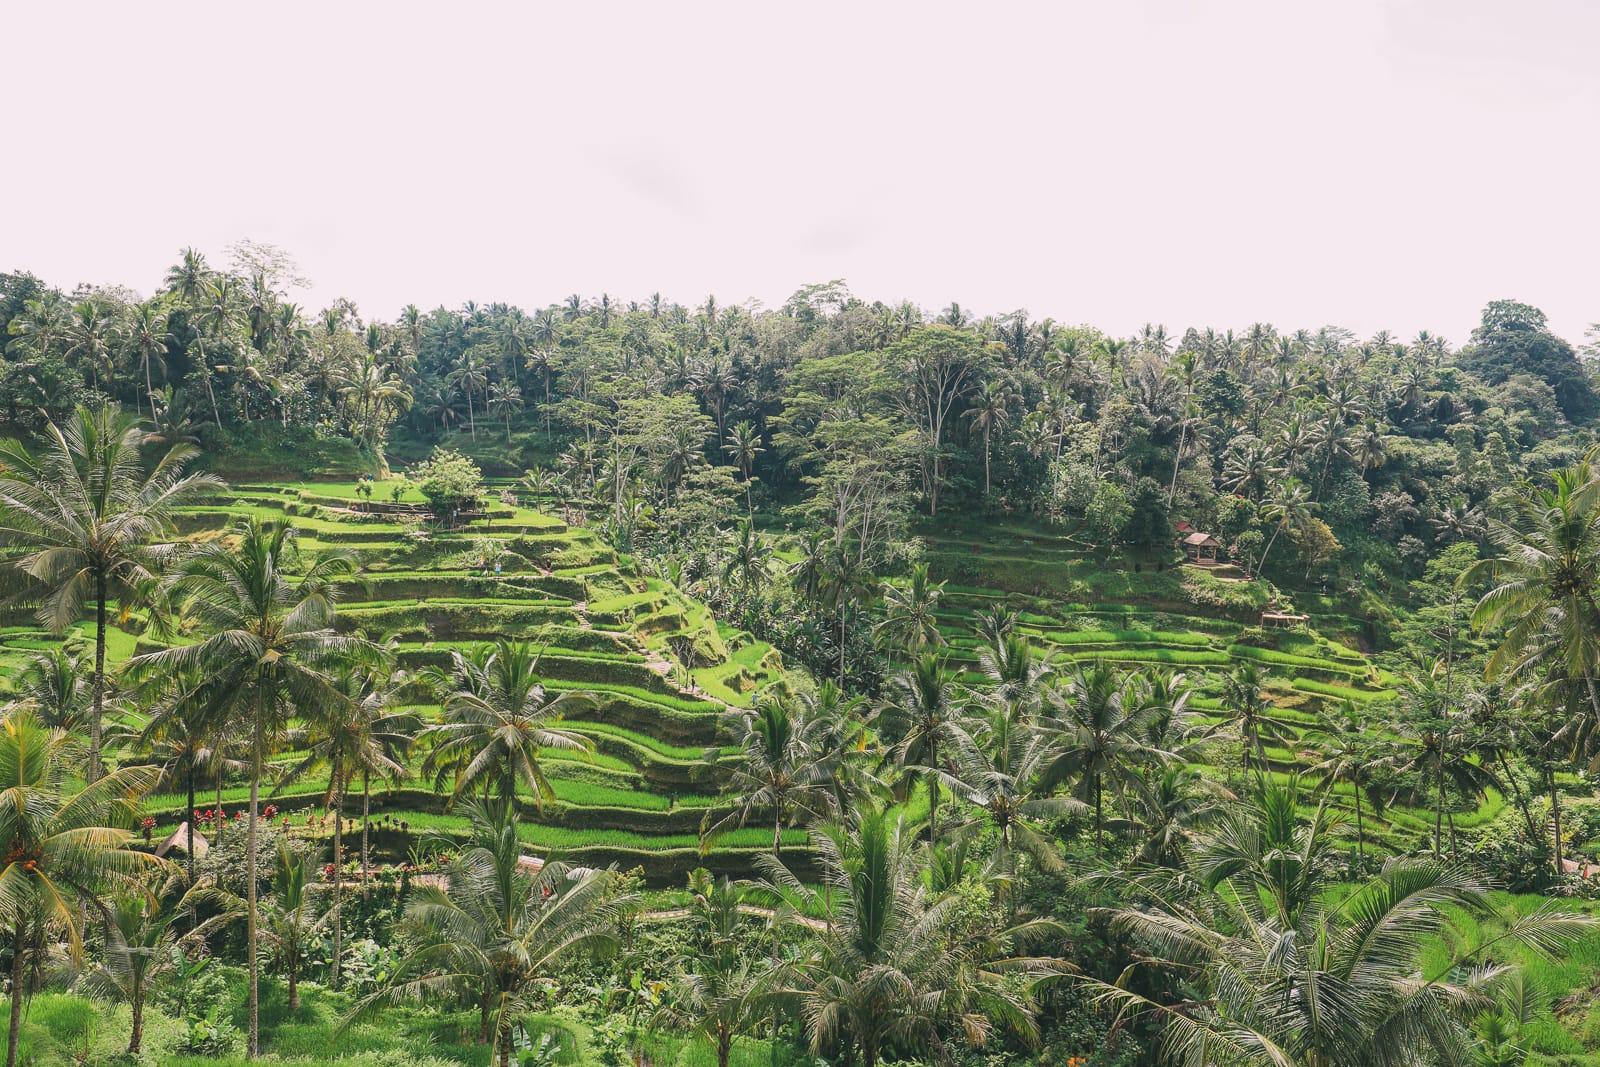 Bali Travel - Tegalalang Rice Terrace In Ubud And Gunung Kawi Temple (2)